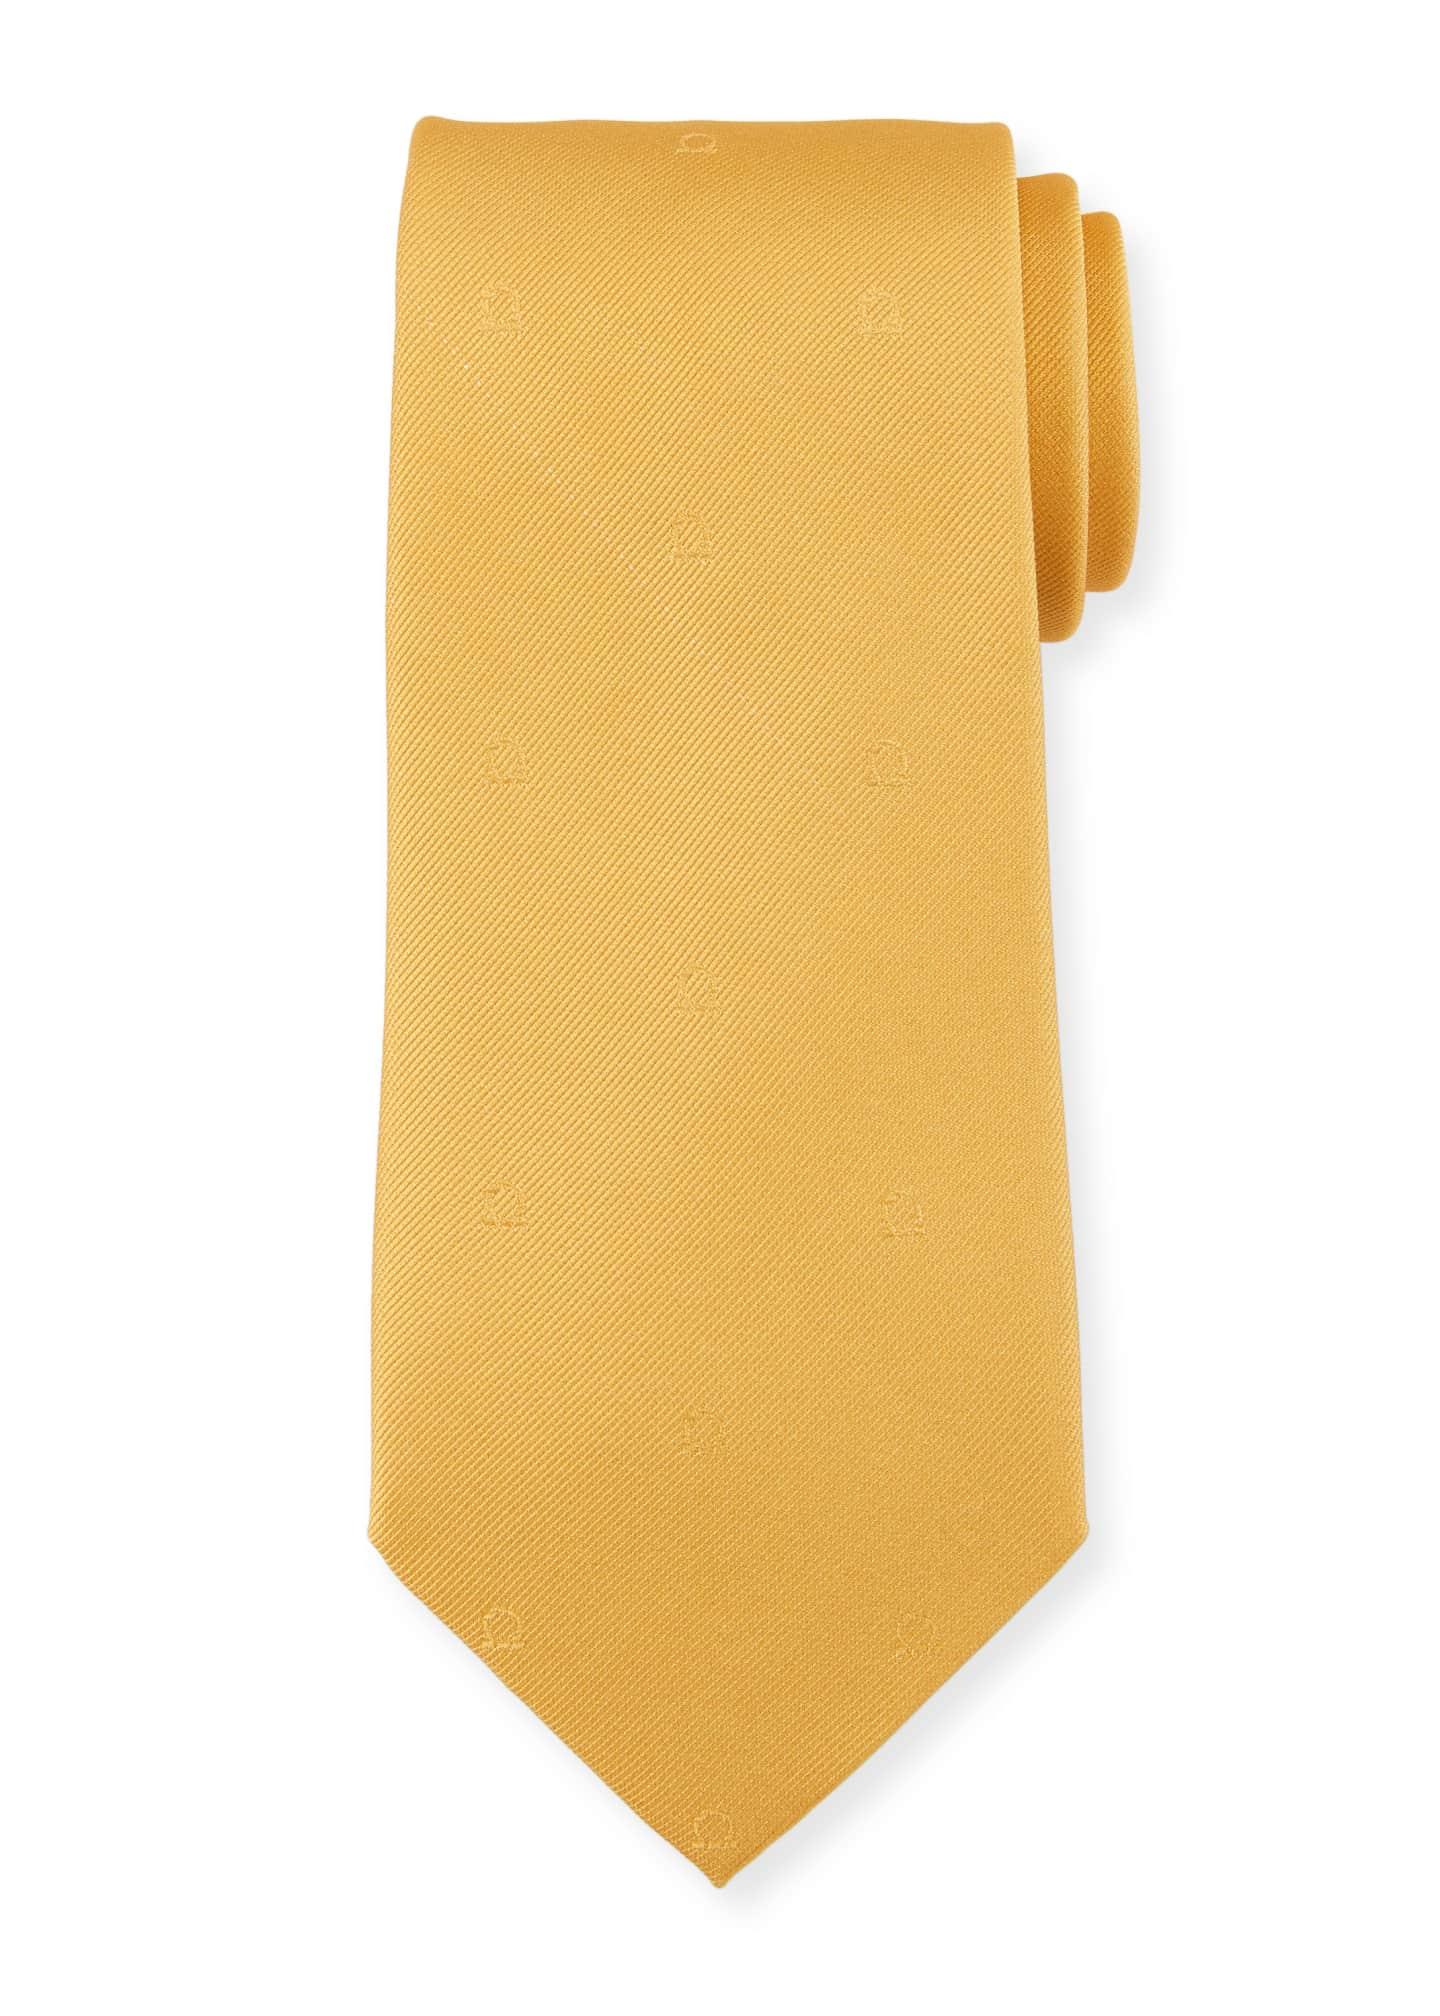 Salvatore Ferragamo Eston Solid Silk Tie, Yellow